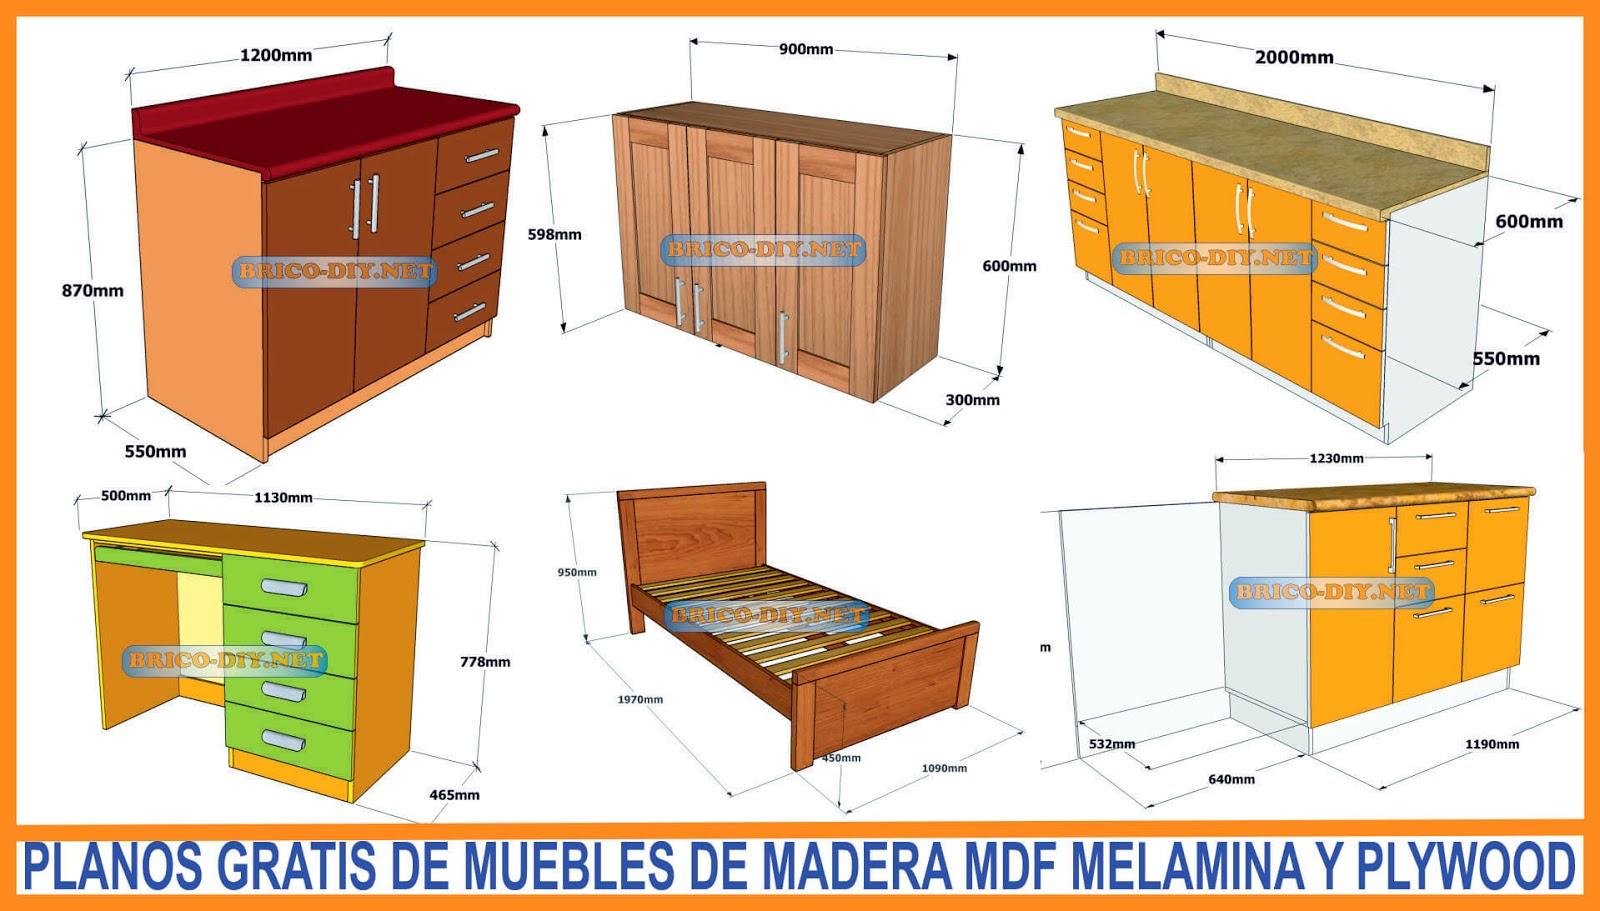 Bricolaje diy planos gratis como hacer muebles de melamina for Planos de muebles de madera pdf